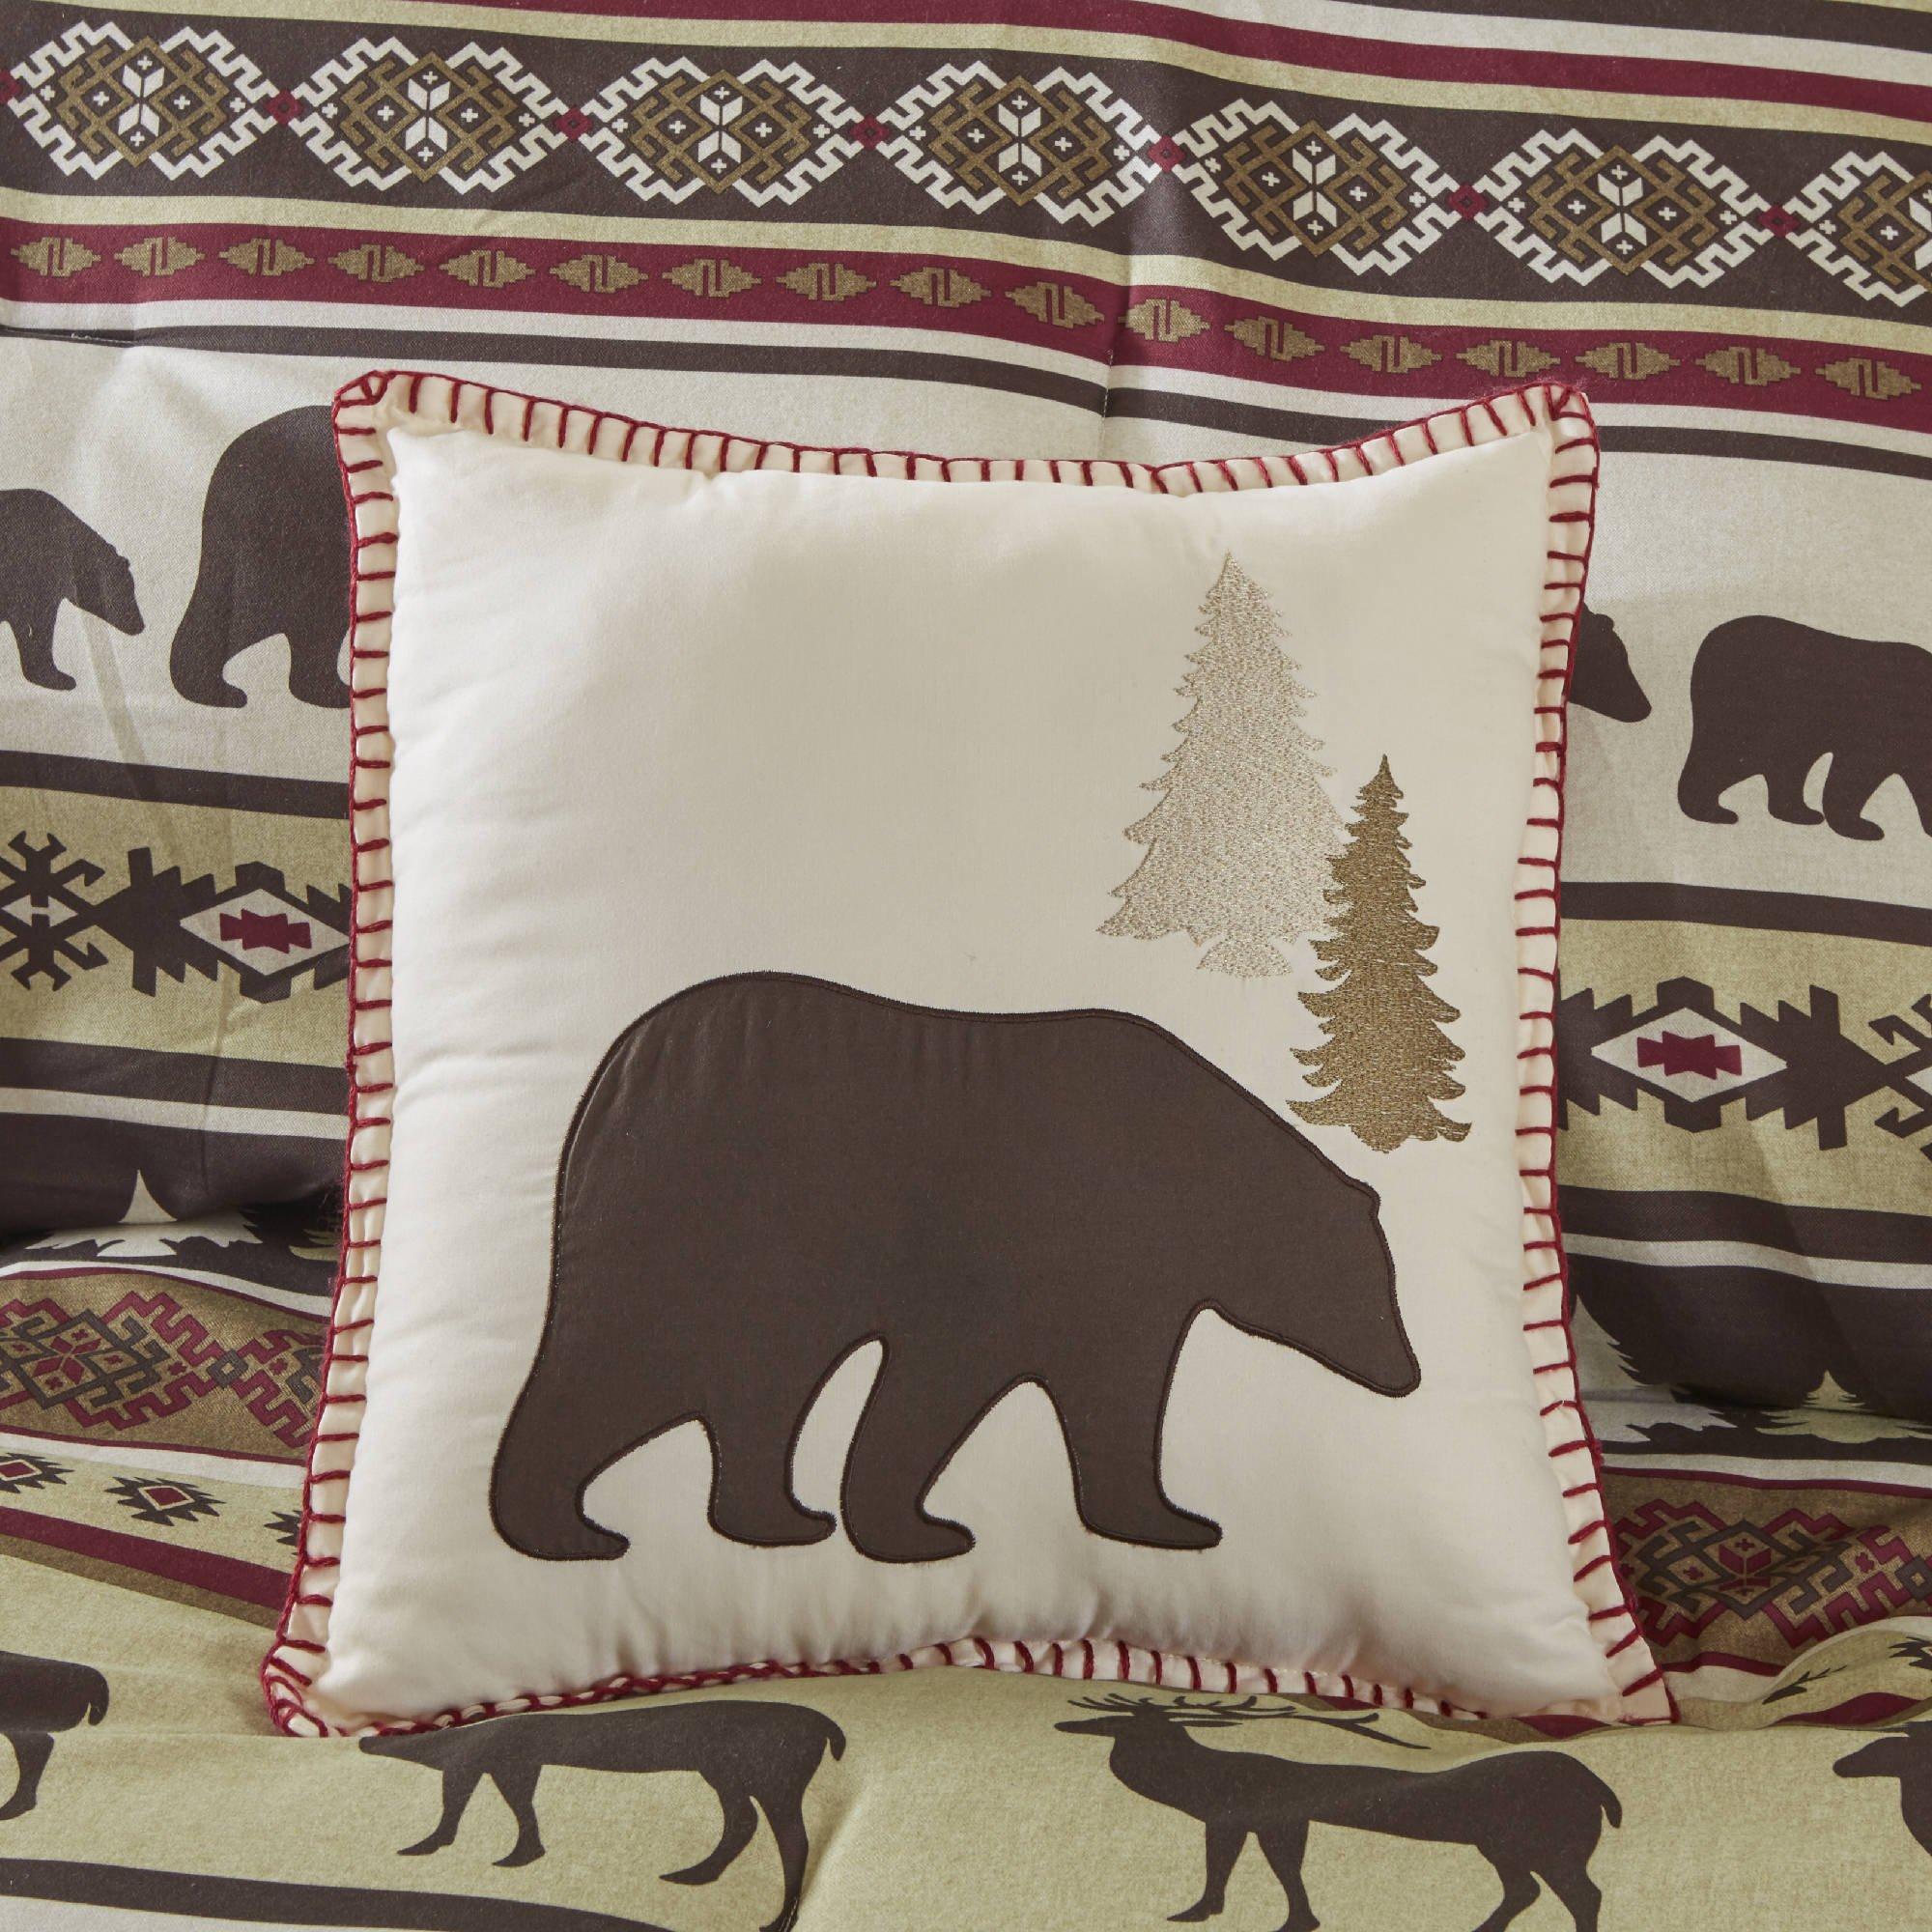 7 Piece Brown Red Cabin Lodge Stripes Pattern Comforter King Set, Beautiful Pine Trees, Bears, Elk Deer, Hunting Animal Stripe-Inspired Nature Motif Design, Soft & Comfy Bedding, Polyester, Unisex by AD (Image #4)